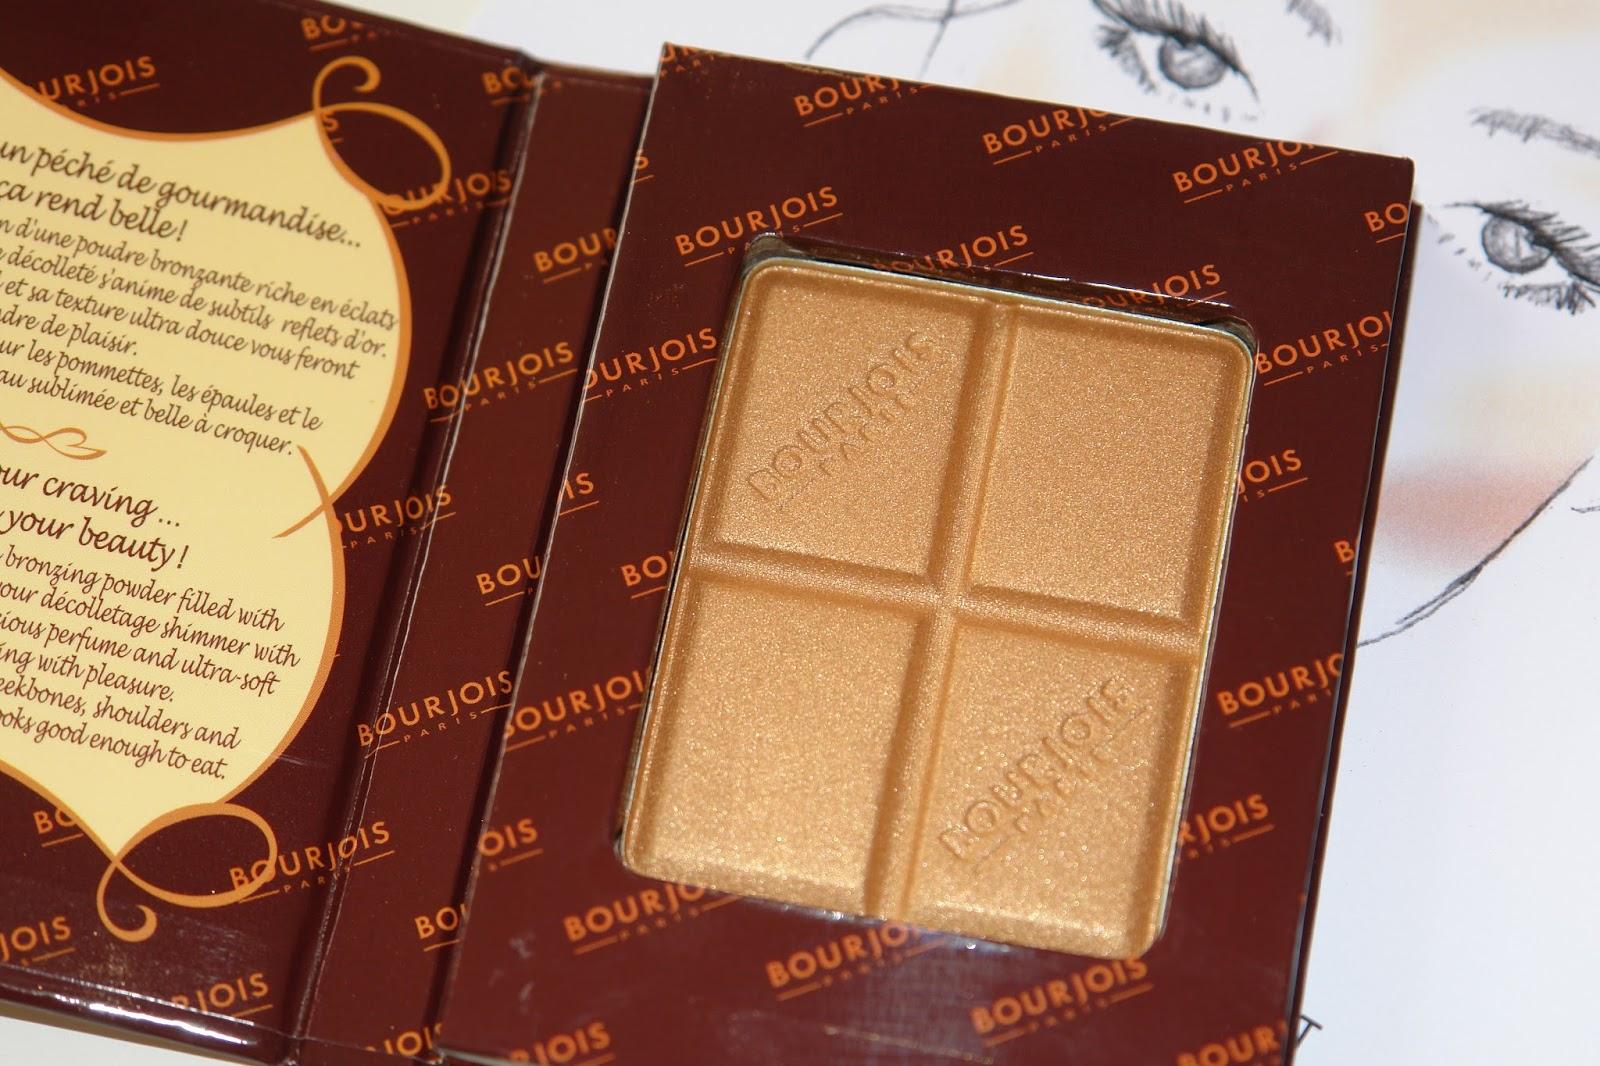 New Bourjois Délice de Poudre bronze powders, beauty, Bourjois, bronzer, make up, review, swatches, blog, UK blogger, Bourjois Délice de Poudre DUO, Bourjois Délice de Poudre Or